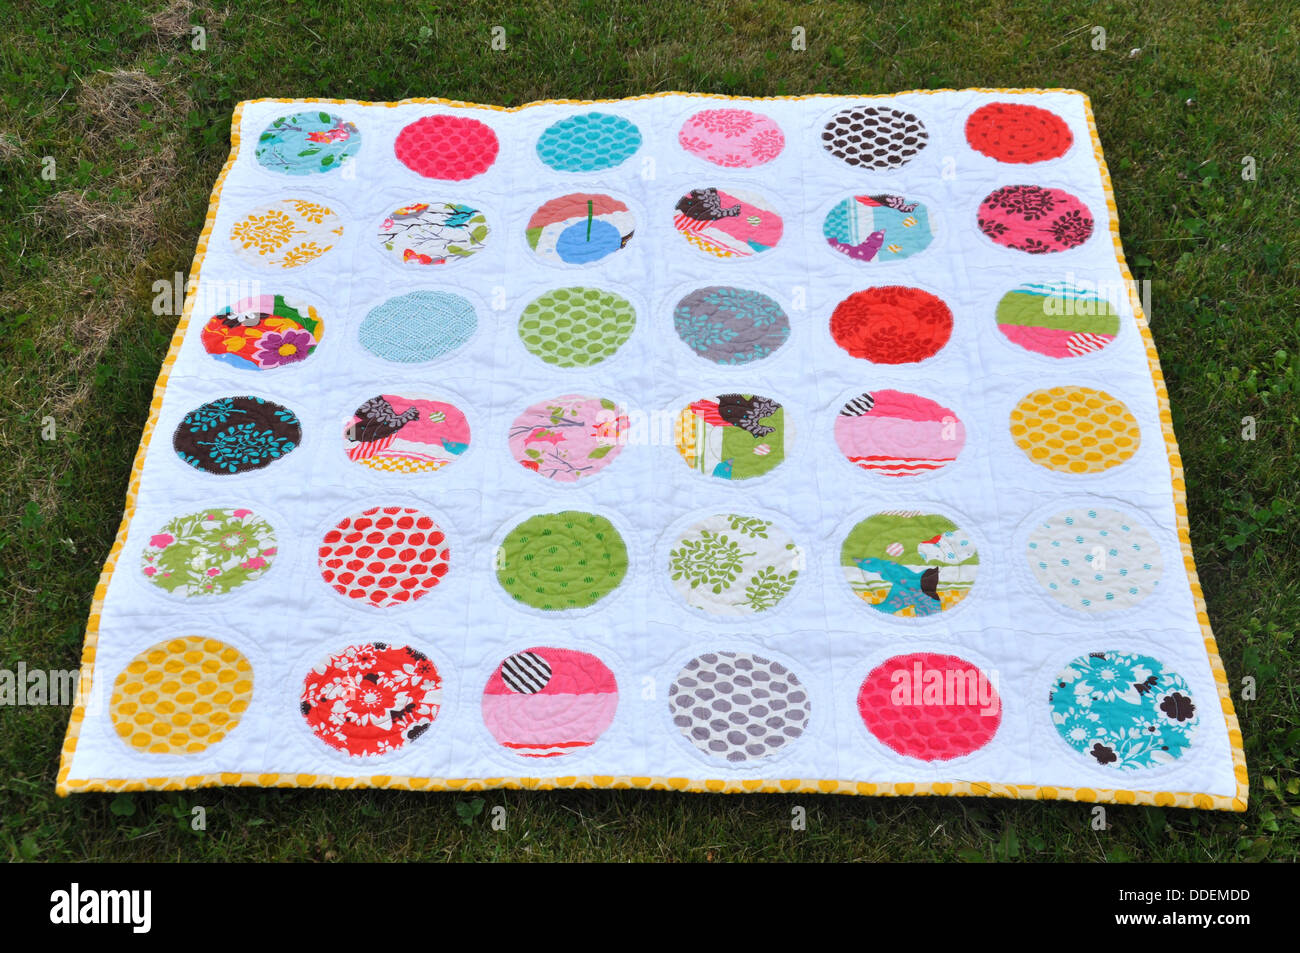 Applique kreise baby quilt stockfoto bild: 59945017 alamy